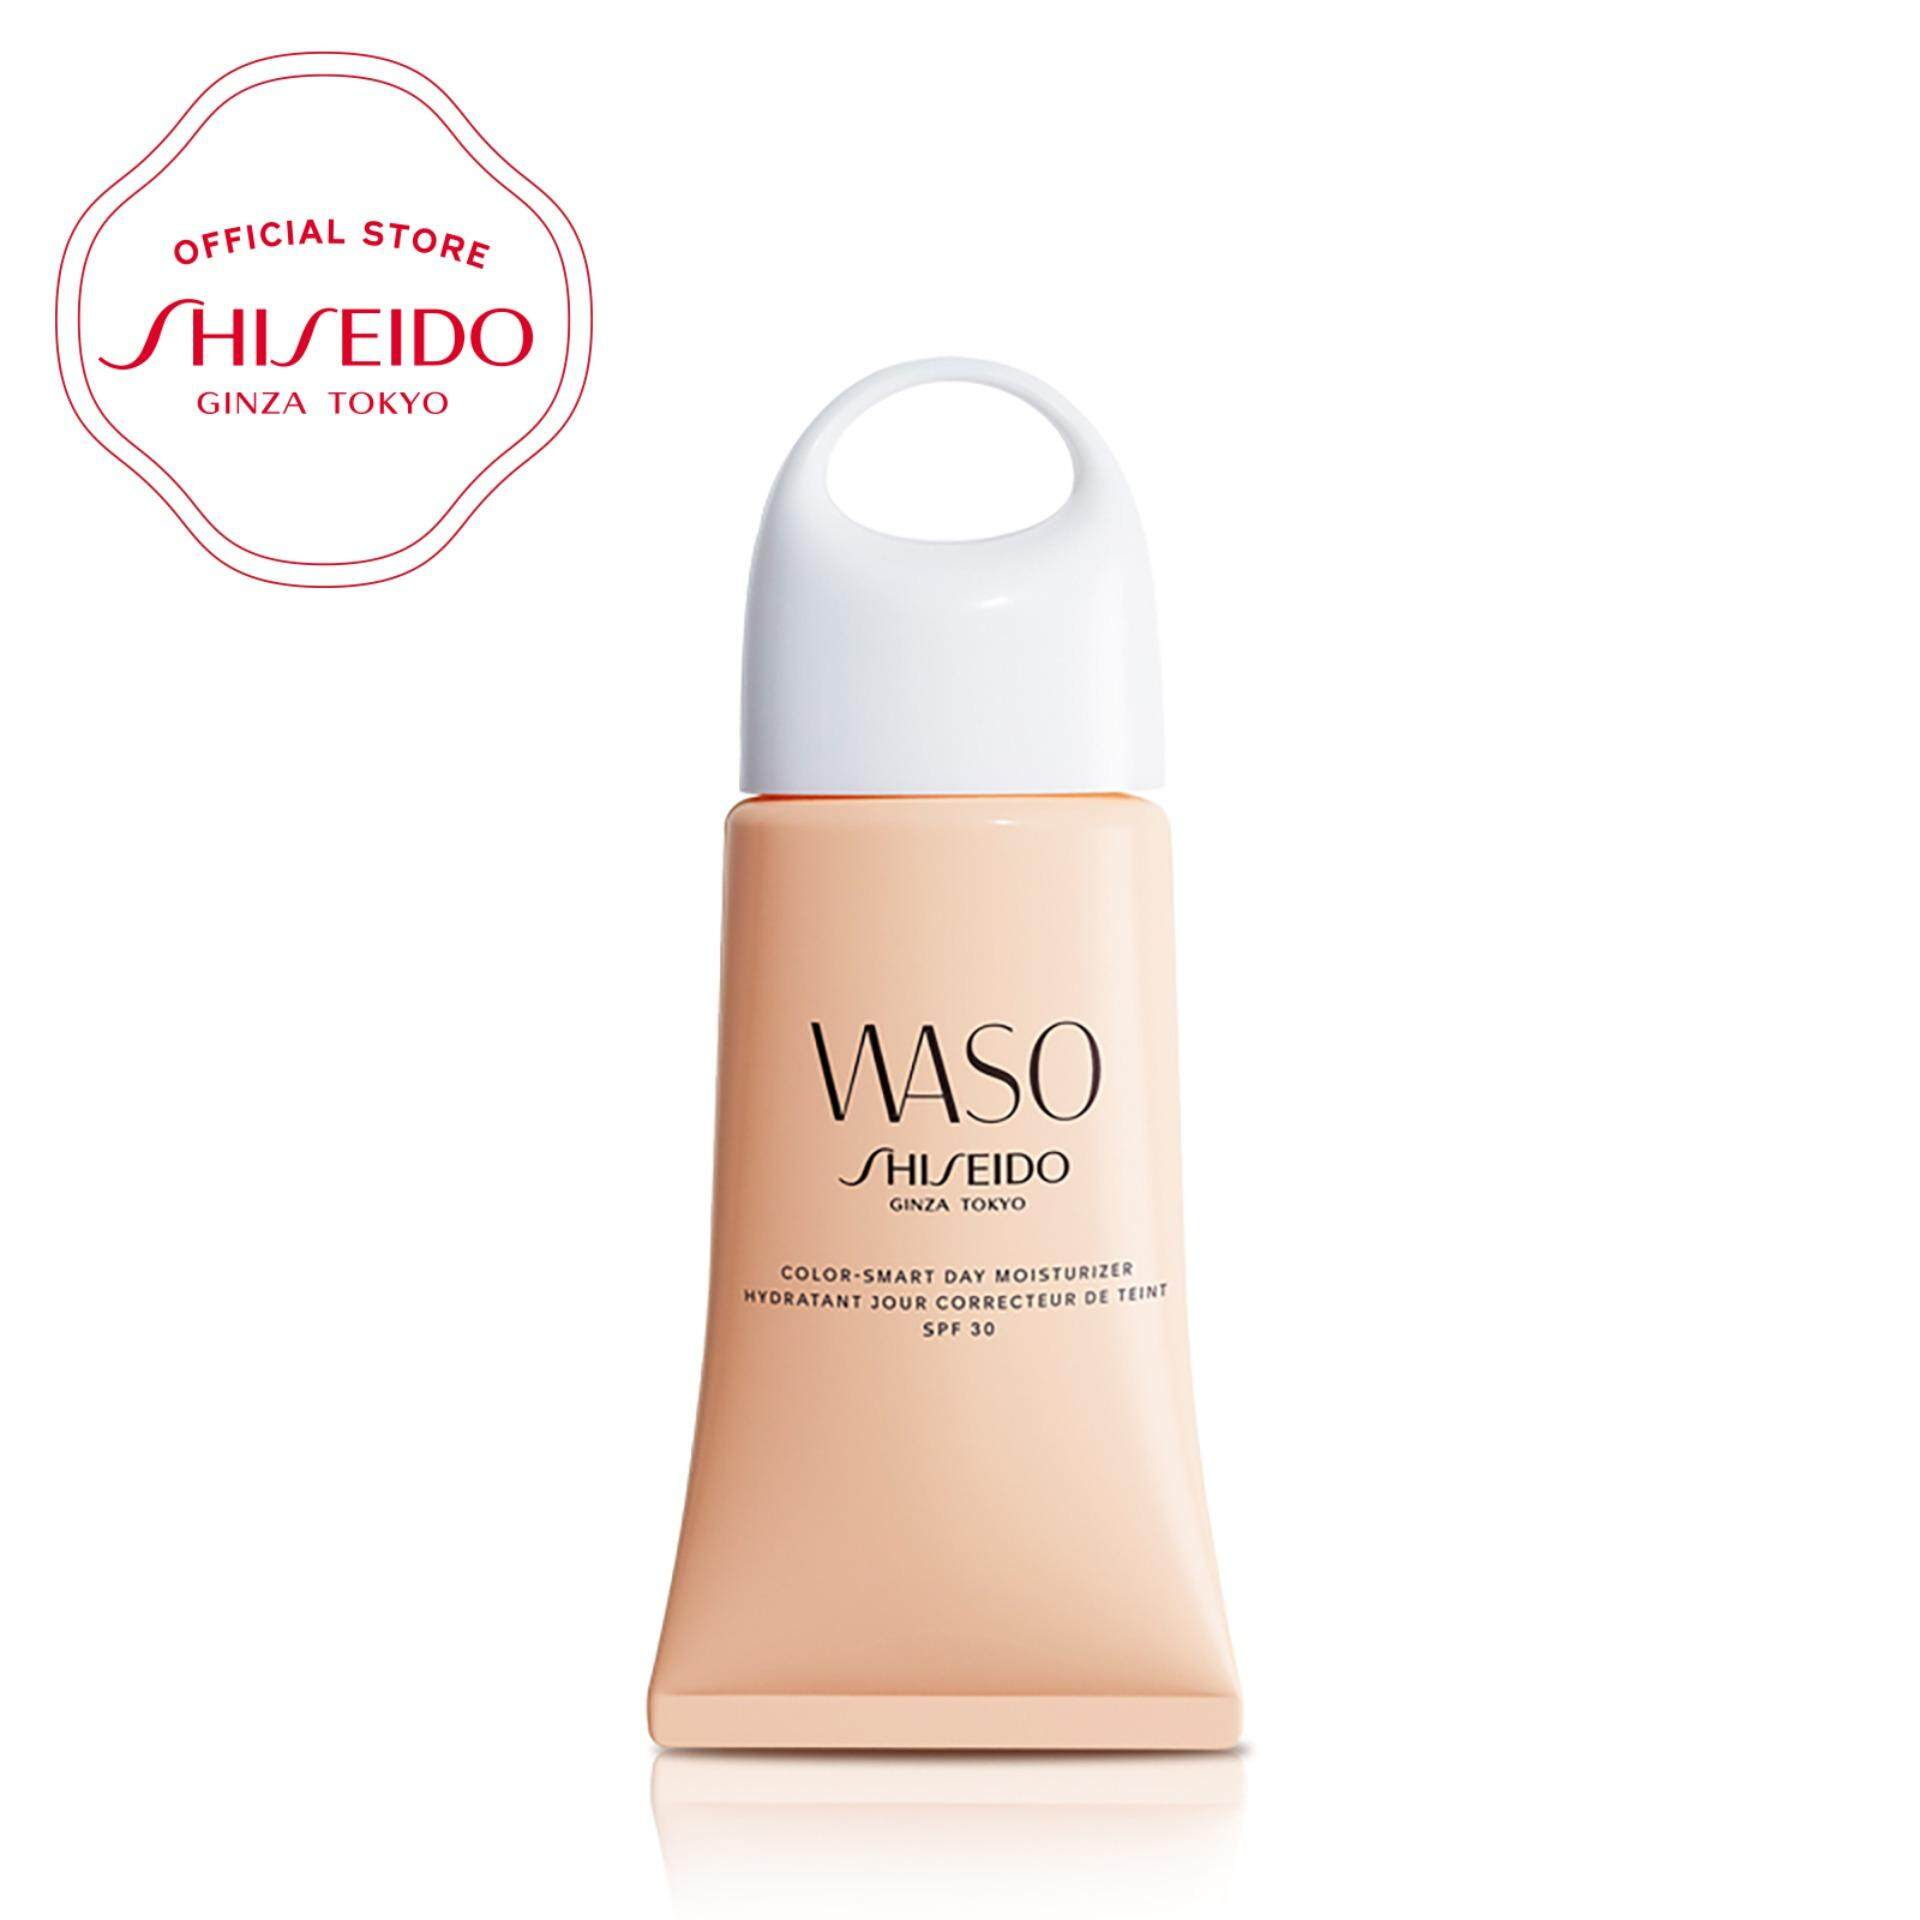 30 Pcs Shiseido Gold Masker Perawatan Wajah Waso Color Smart Day Moisturizer 50ml